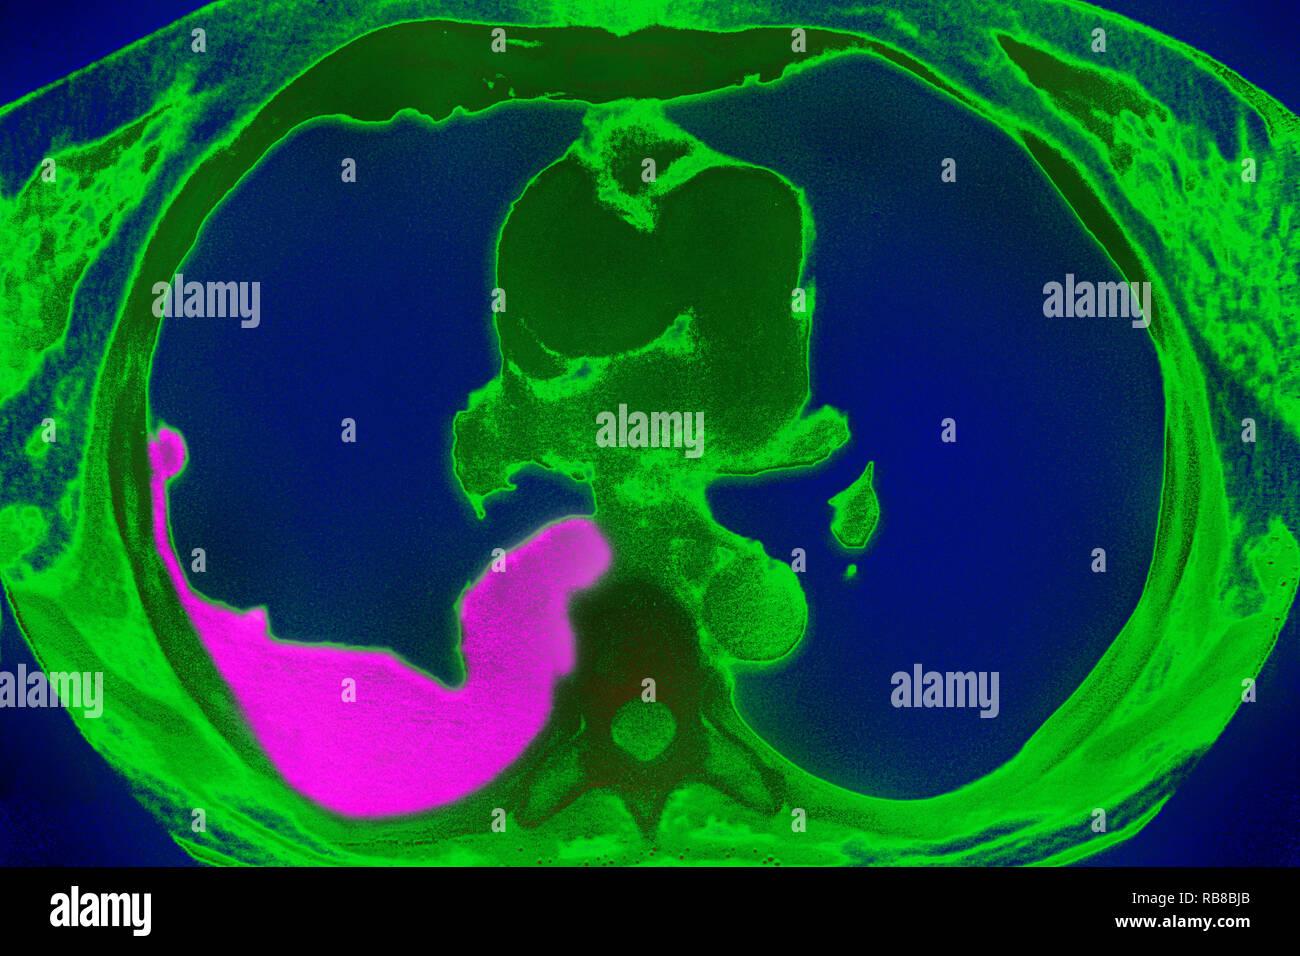 PLEURISY CT SCAN - Stock Image